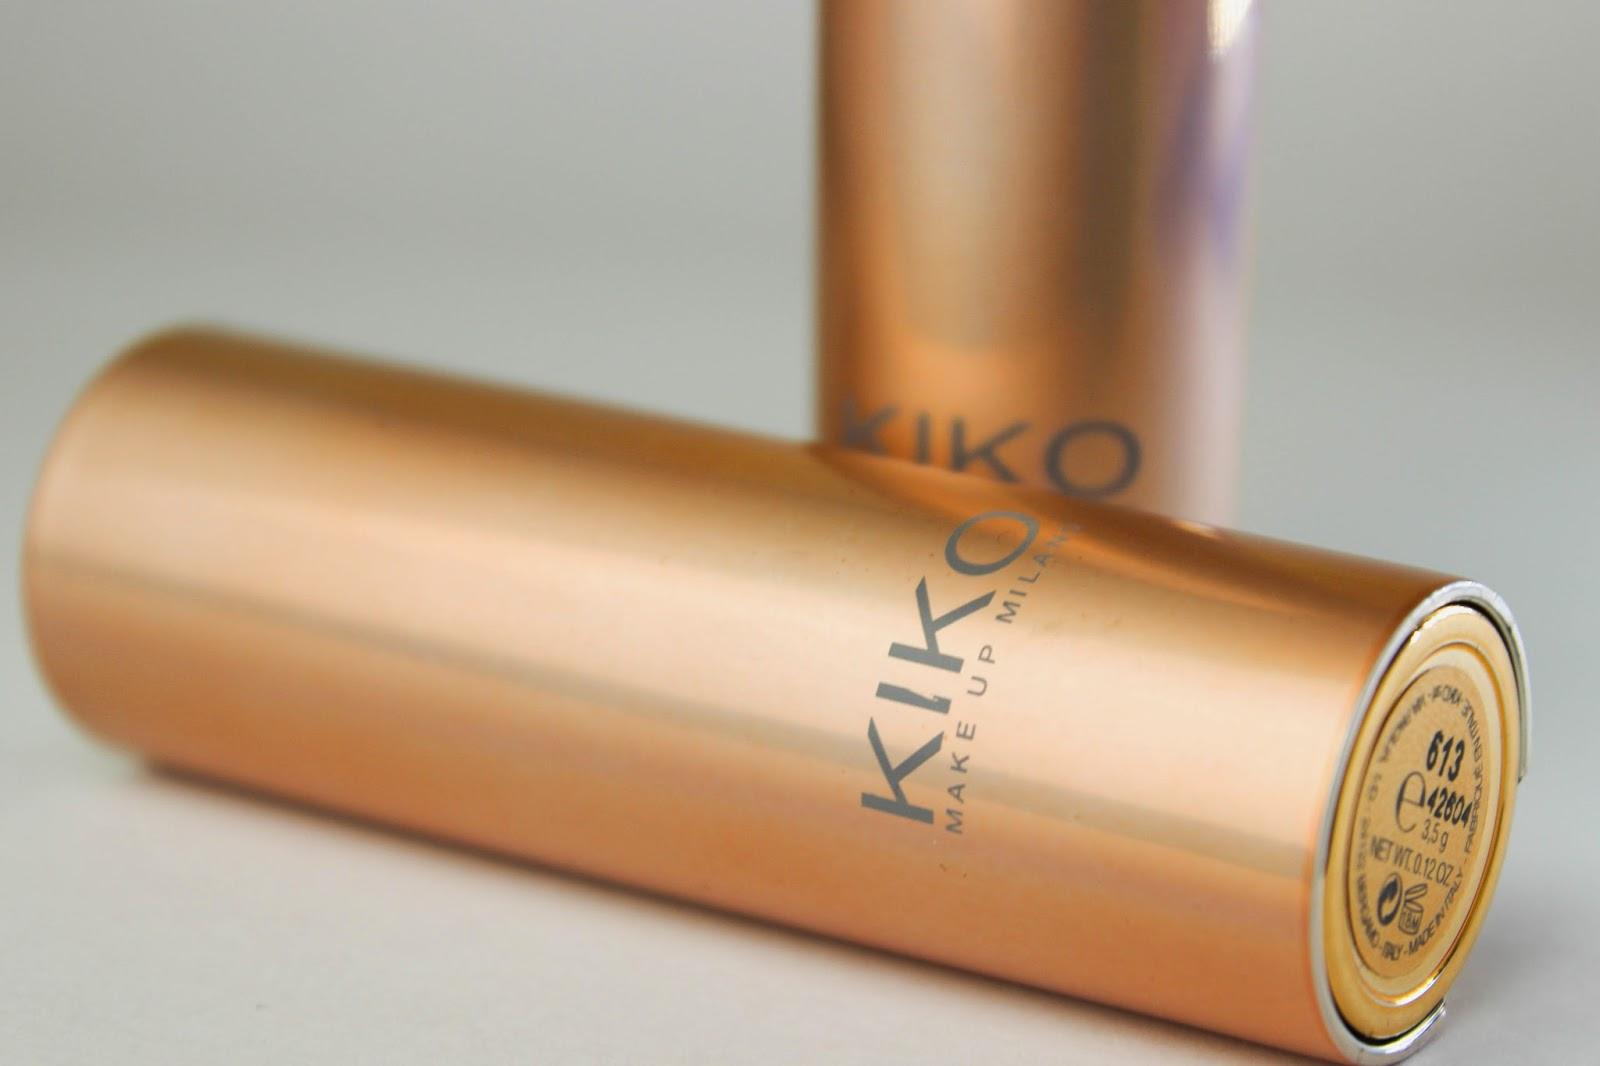 KIKO Velvet Matte Lipsticks Review Swatch 605 Orange Red 613 Pink Carnation